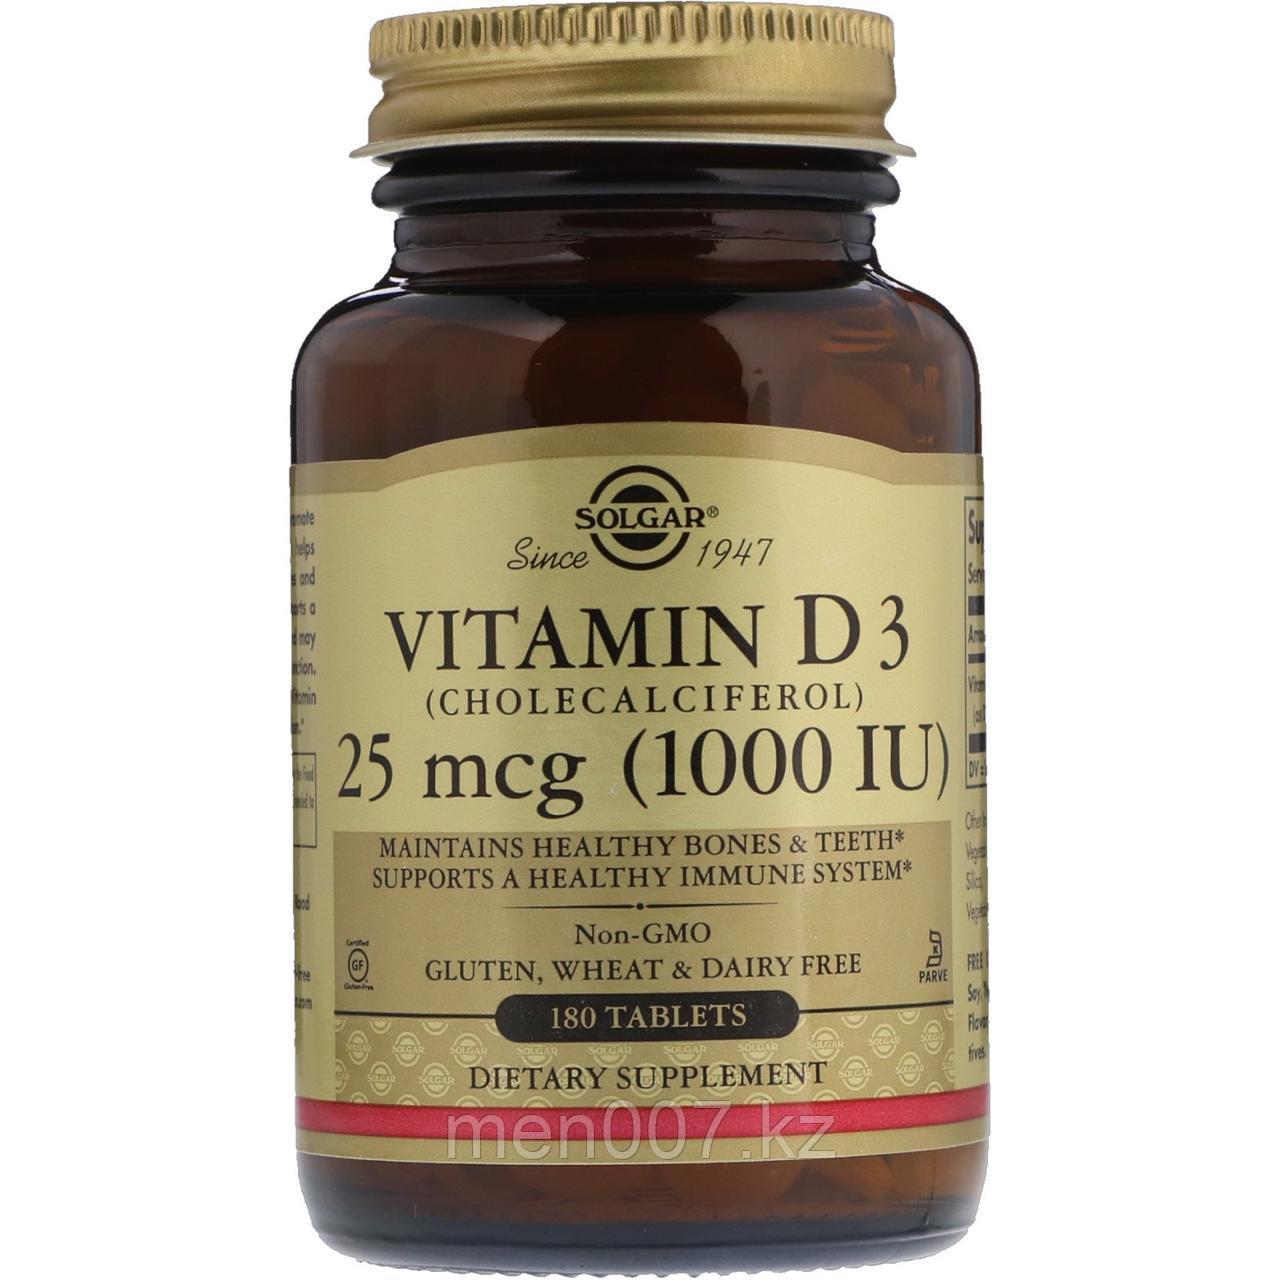 БАД Витамин D3, 1000 IU Солгар (180 таблеток)